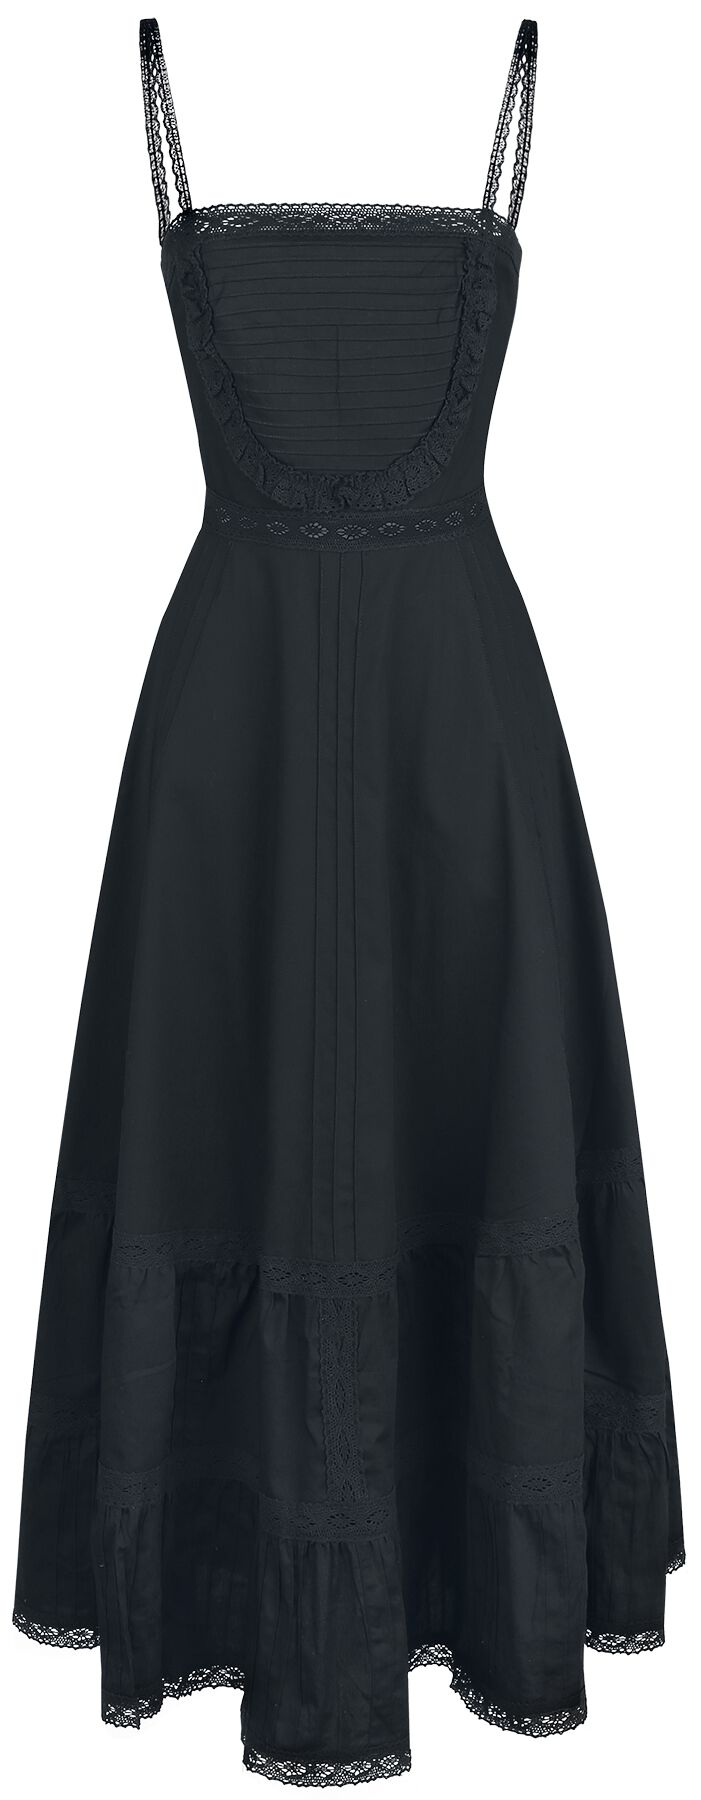 3dc8d8484 Spin Doctor Amara Mini Dress Kjole sort